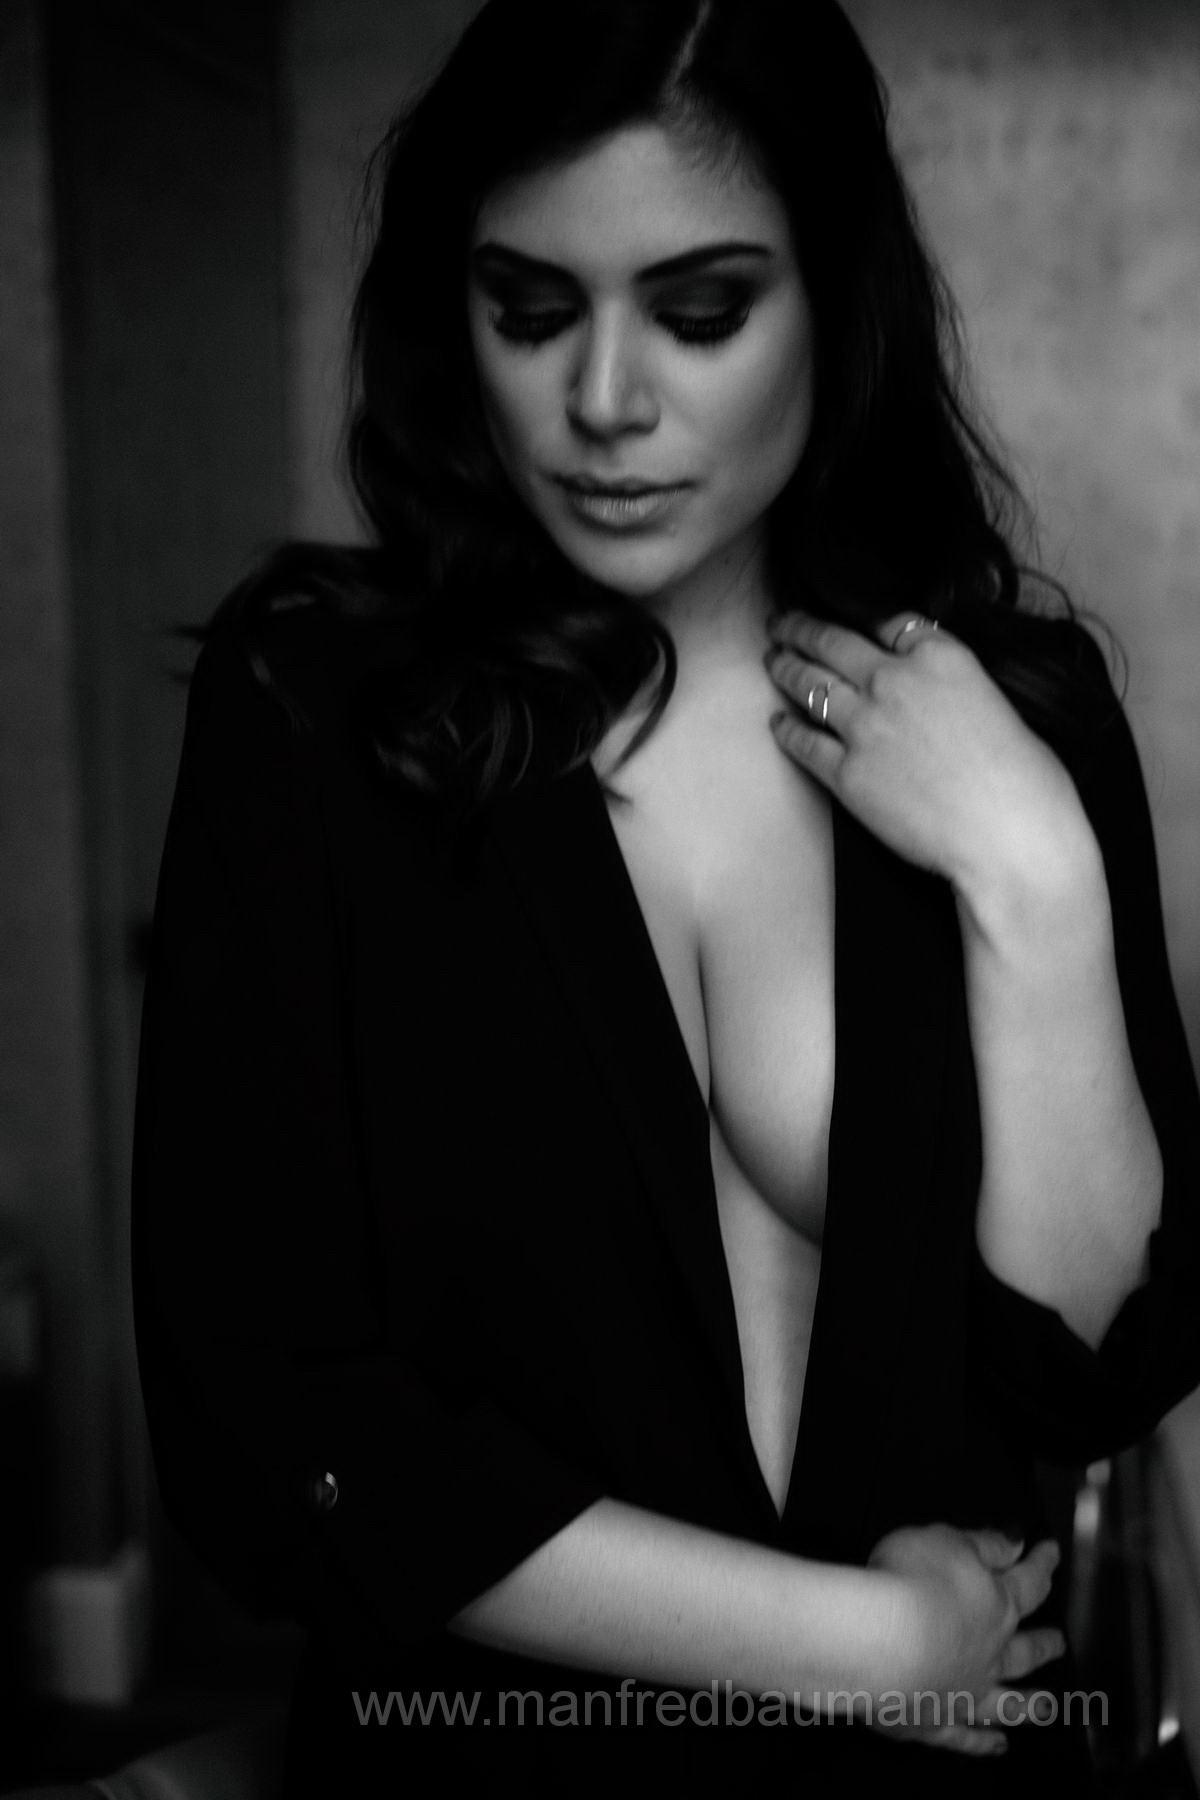 Boobs Evelyn Sommer nude (46 photos), Ass, Hot, Selfie, lingerie 2006